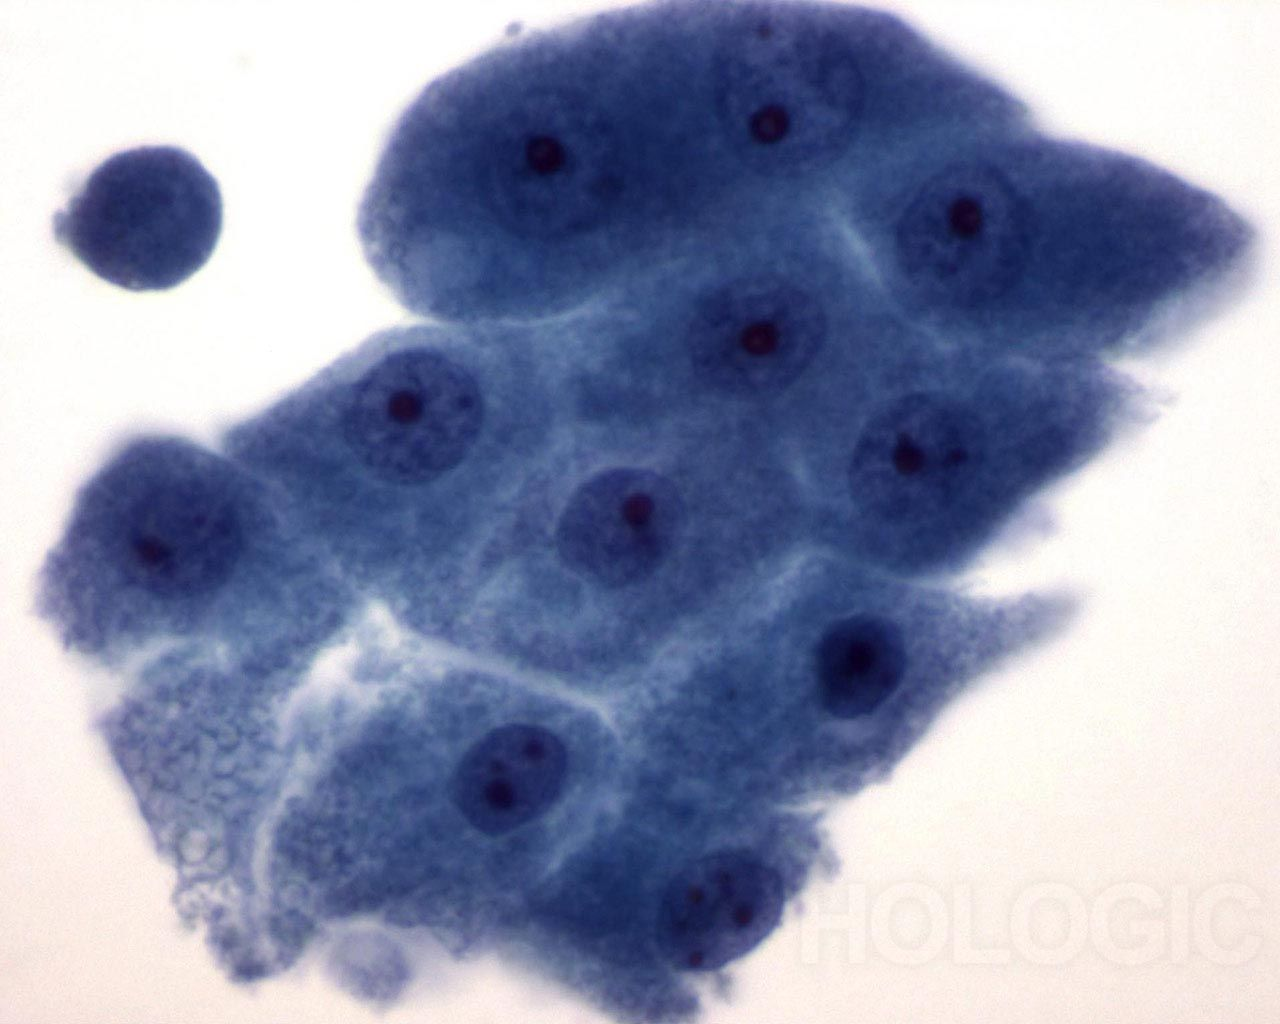 apocrine metaplasie (cystic) - Pap kleuring